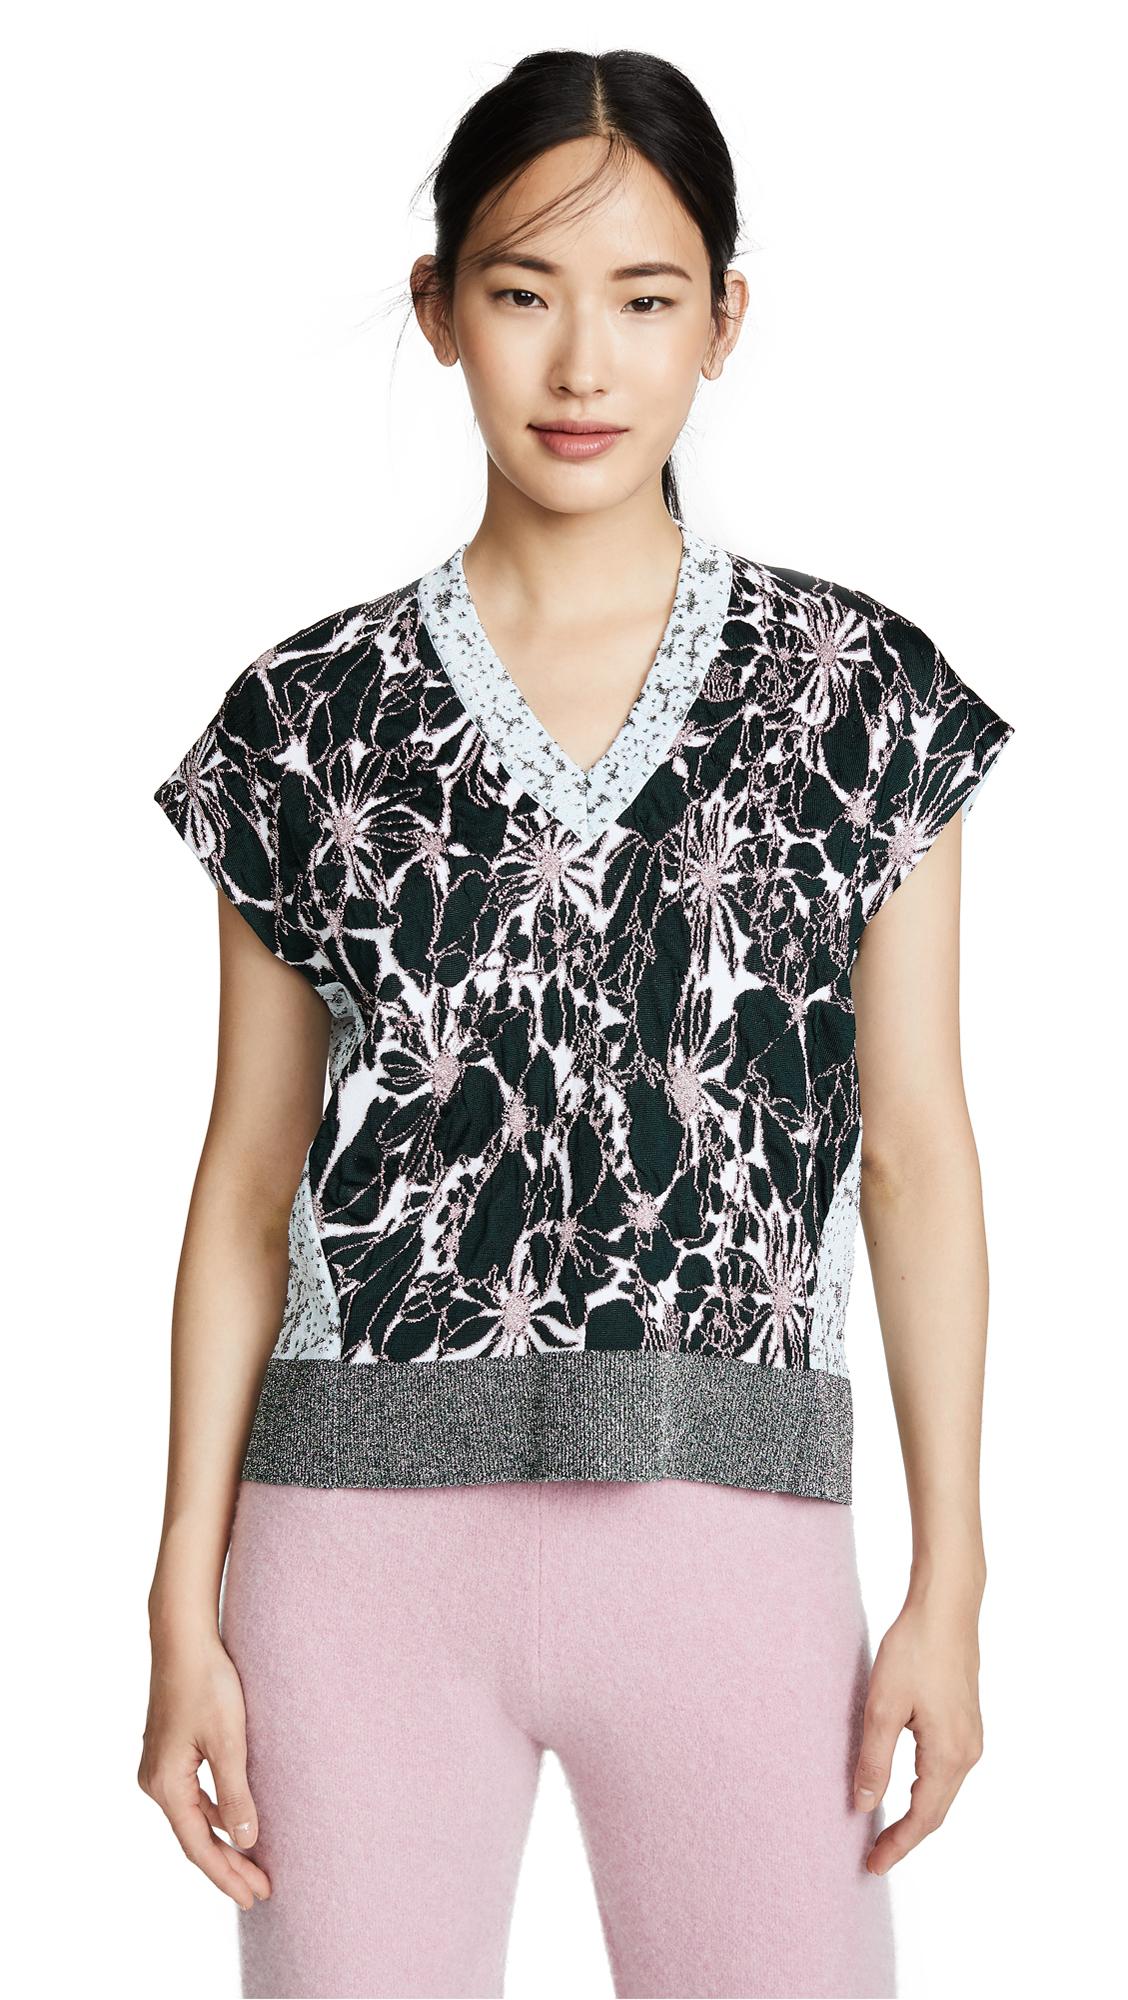 Cedric Charlier Graphic Sweater - Grey Multi